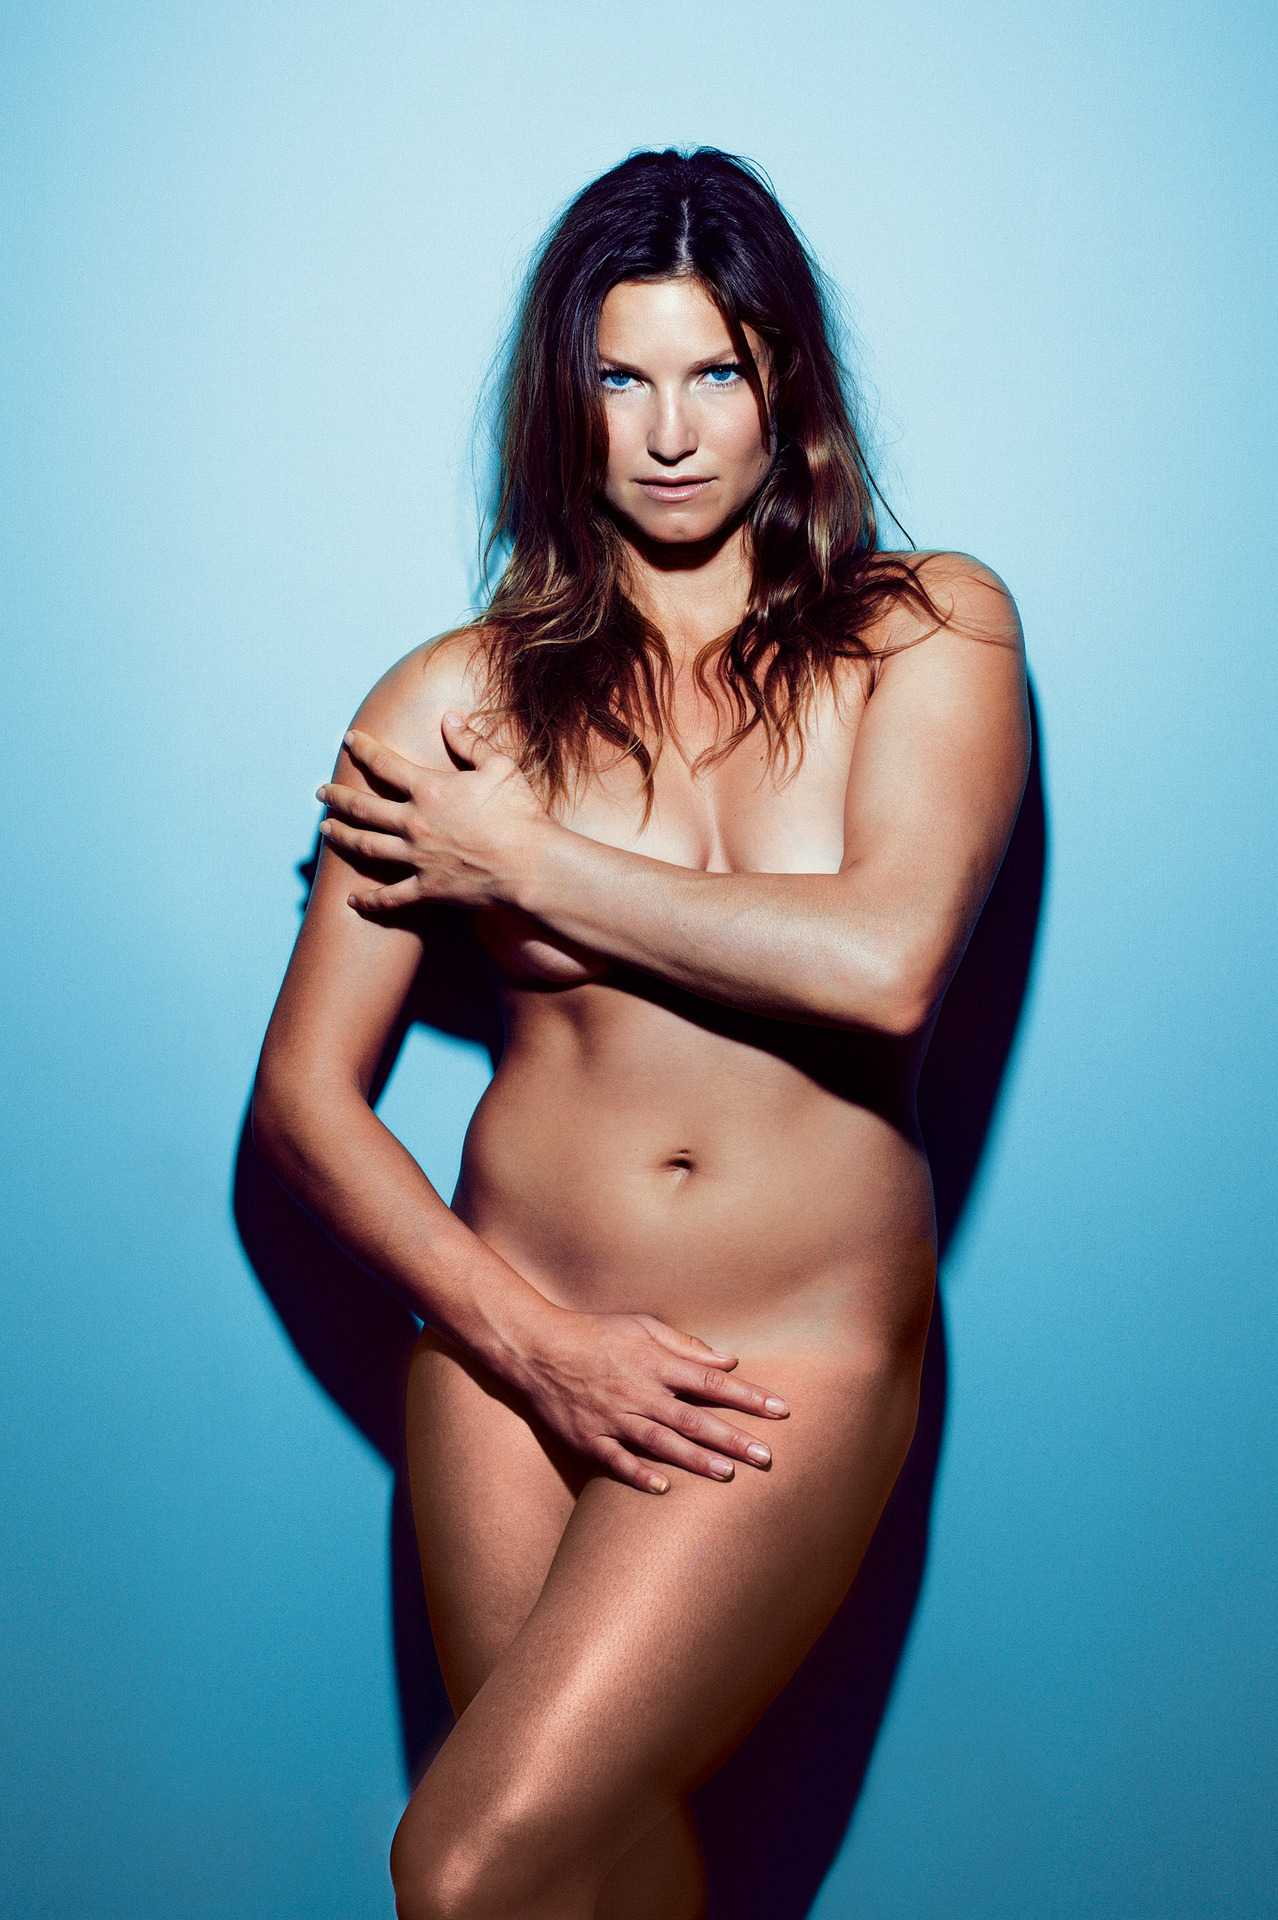 julia-mancuso-olypics-sexy-pics-1_R